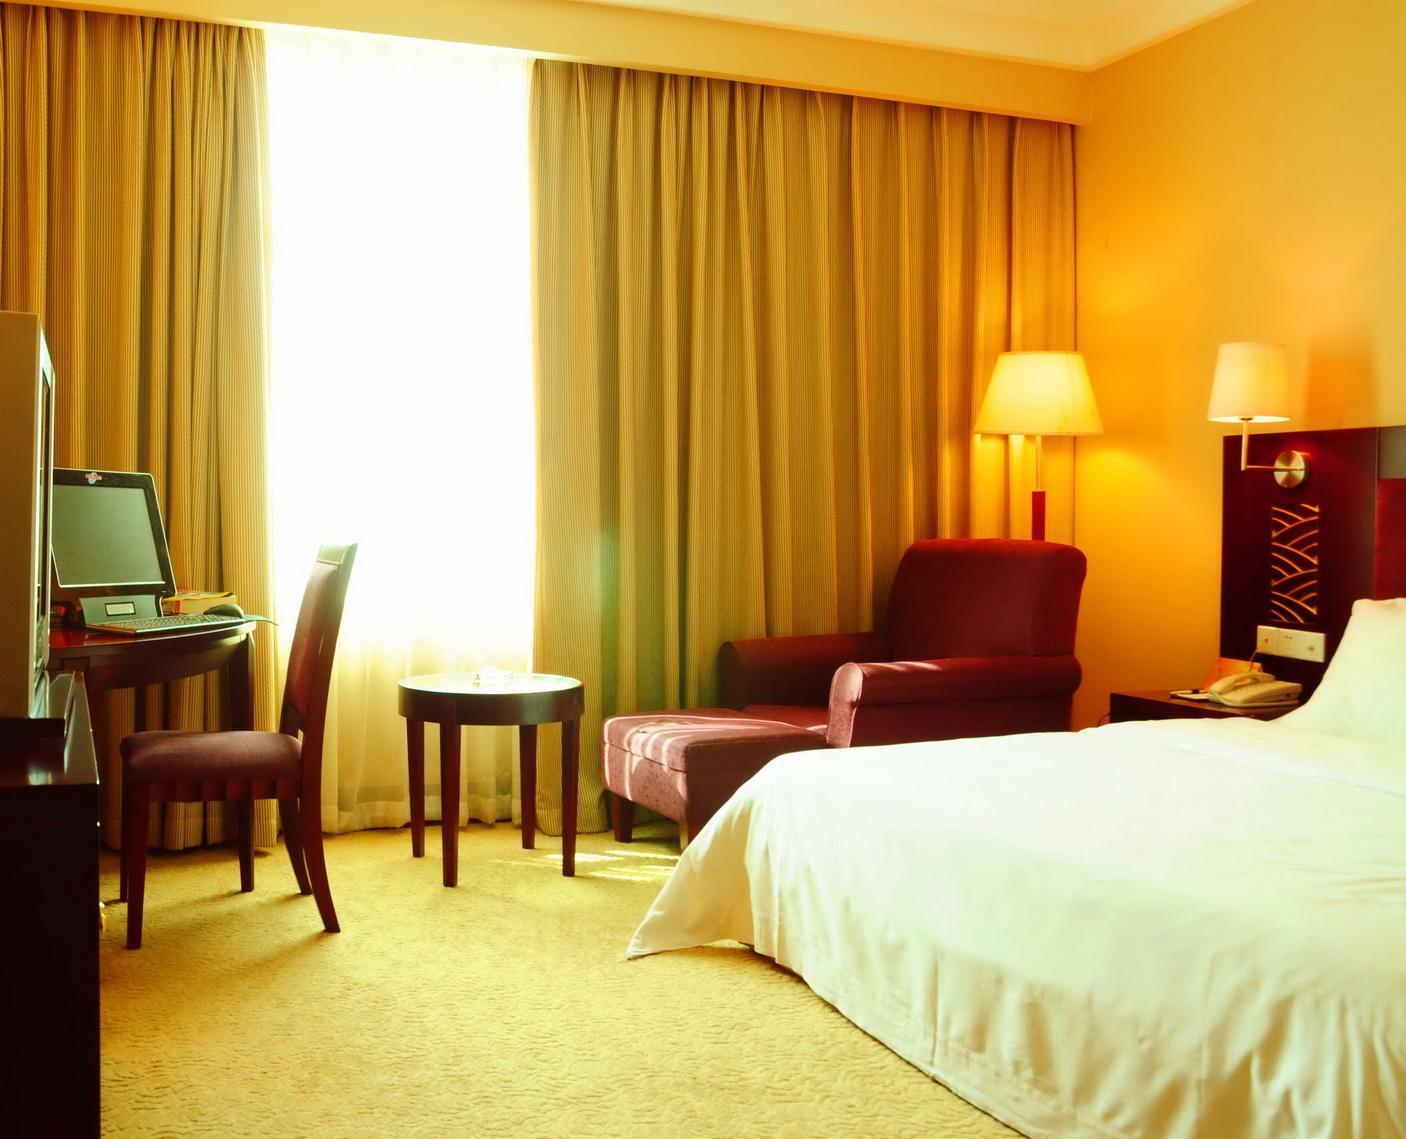 Beautiful Hotel Curtain / Motorized drapes and curtain